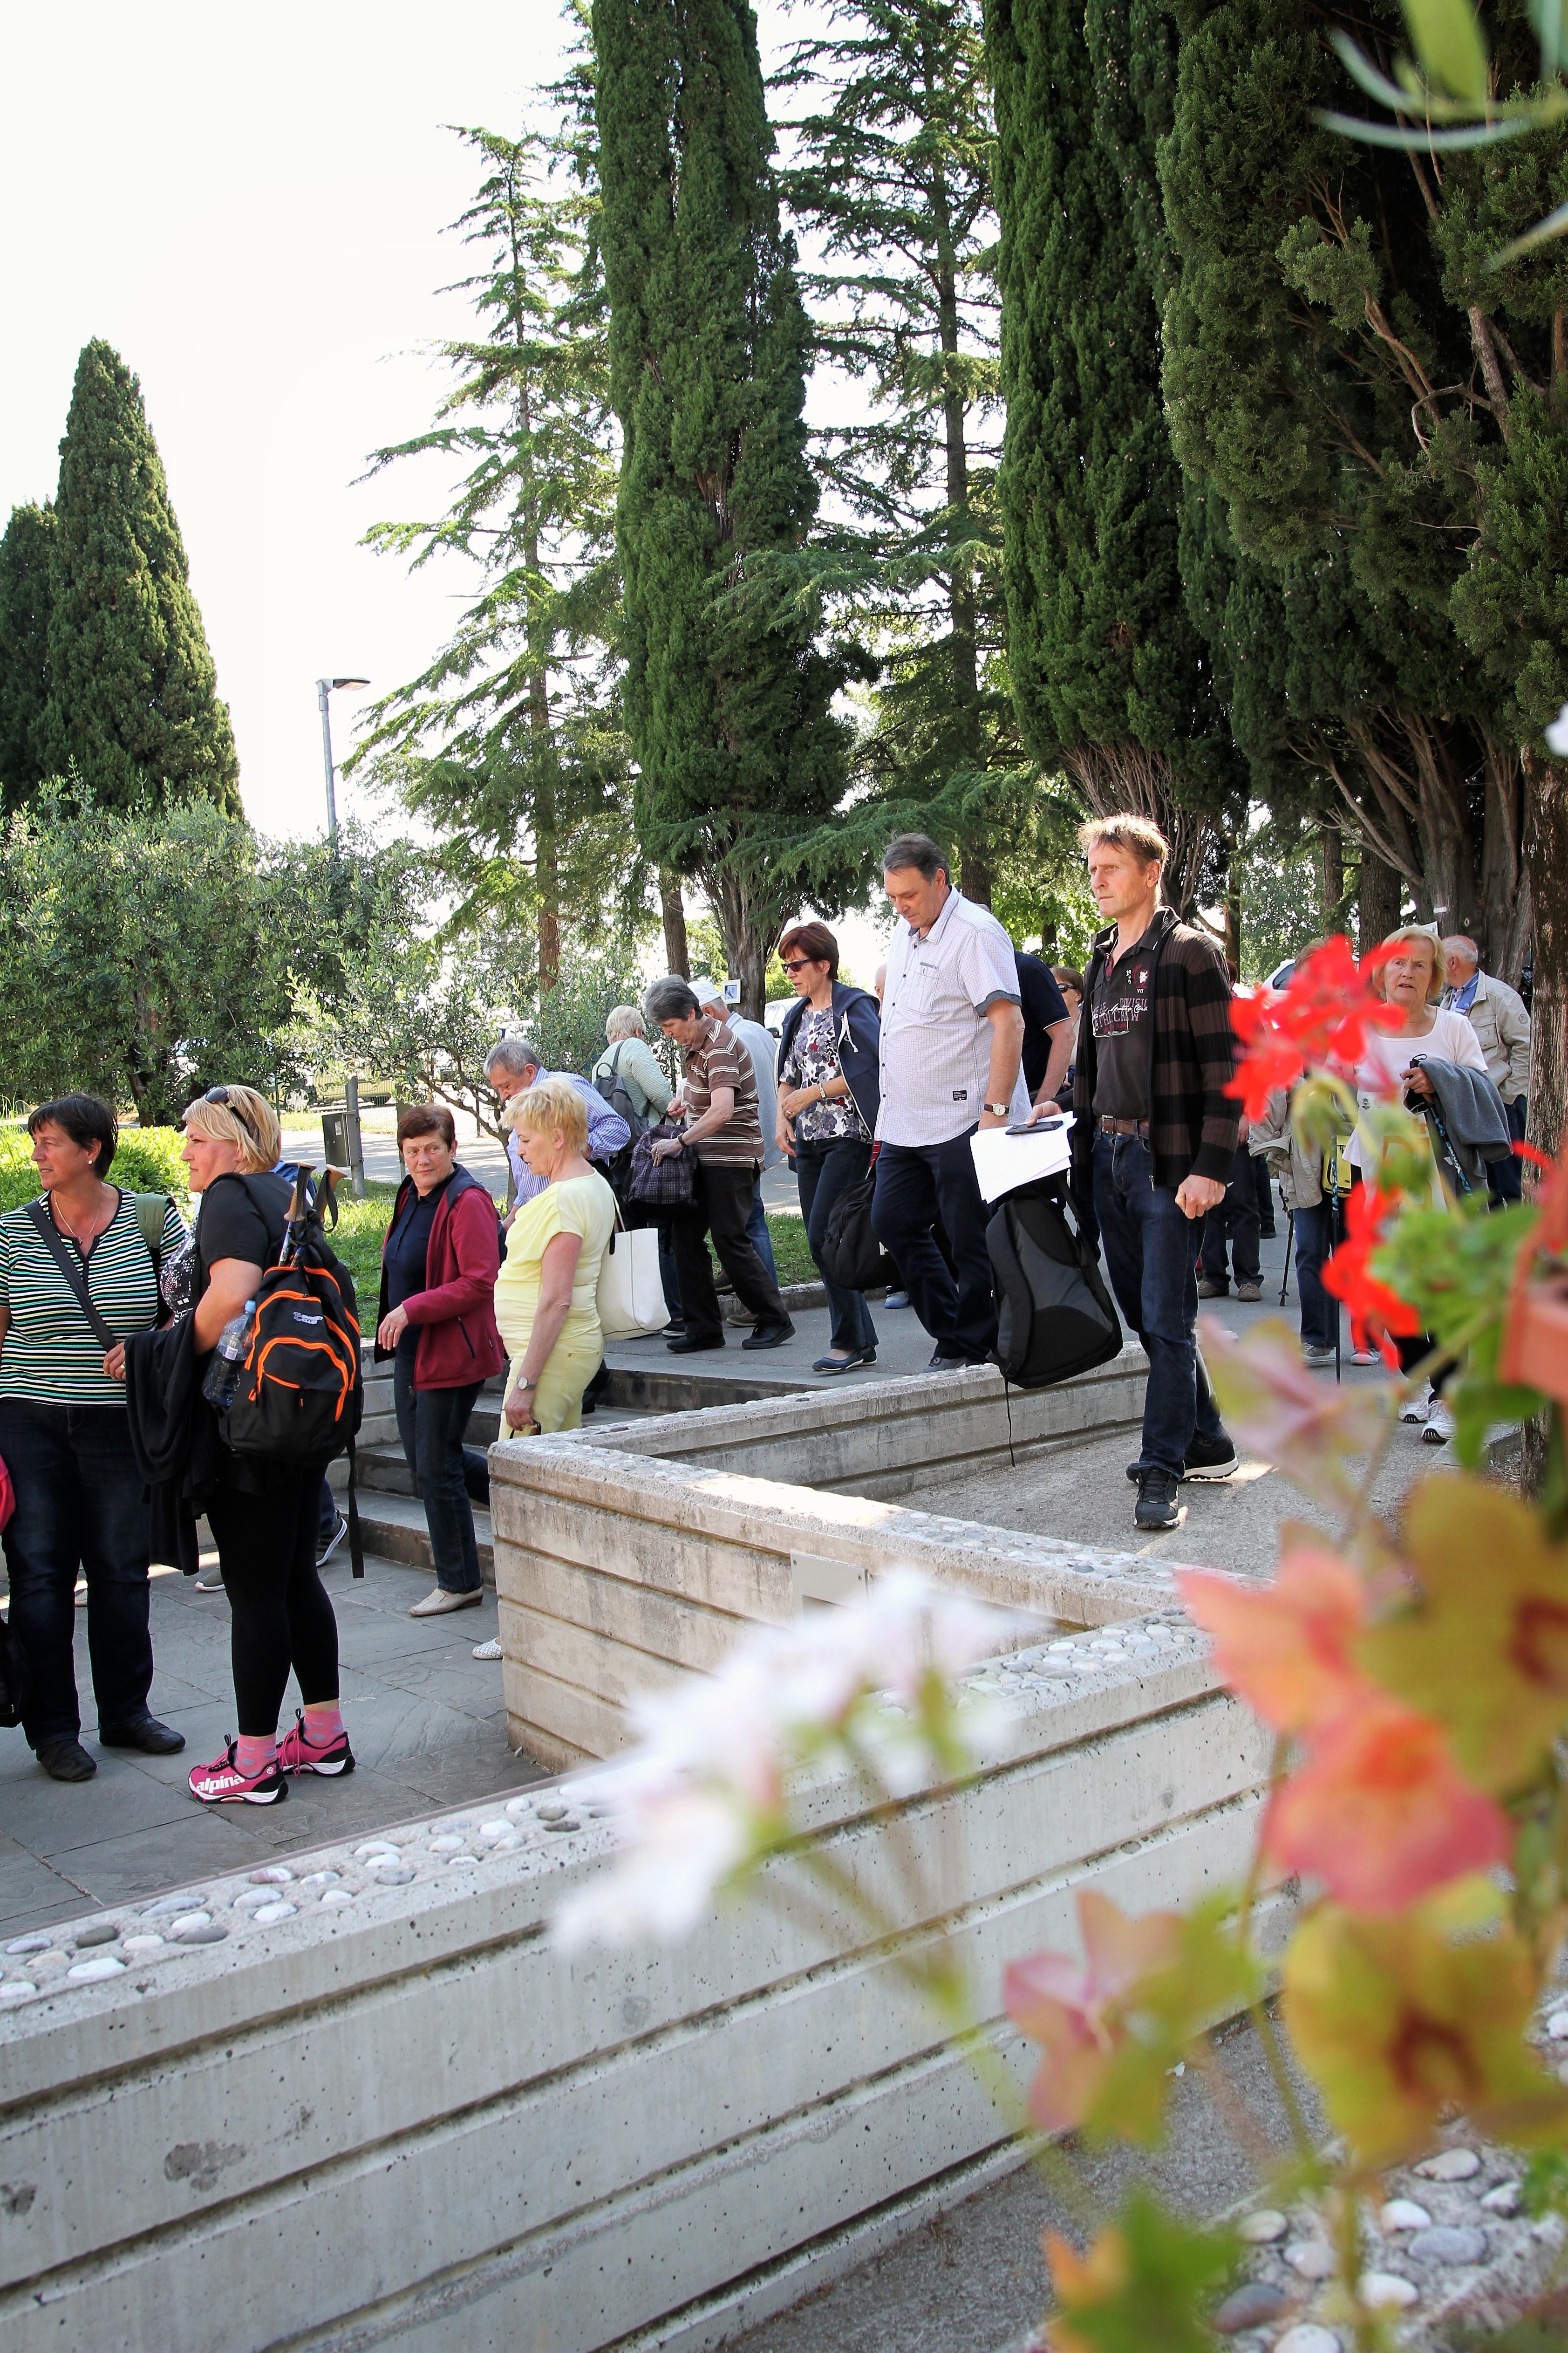 Srečanje članov društva Trepetlika na Debelem rtiču